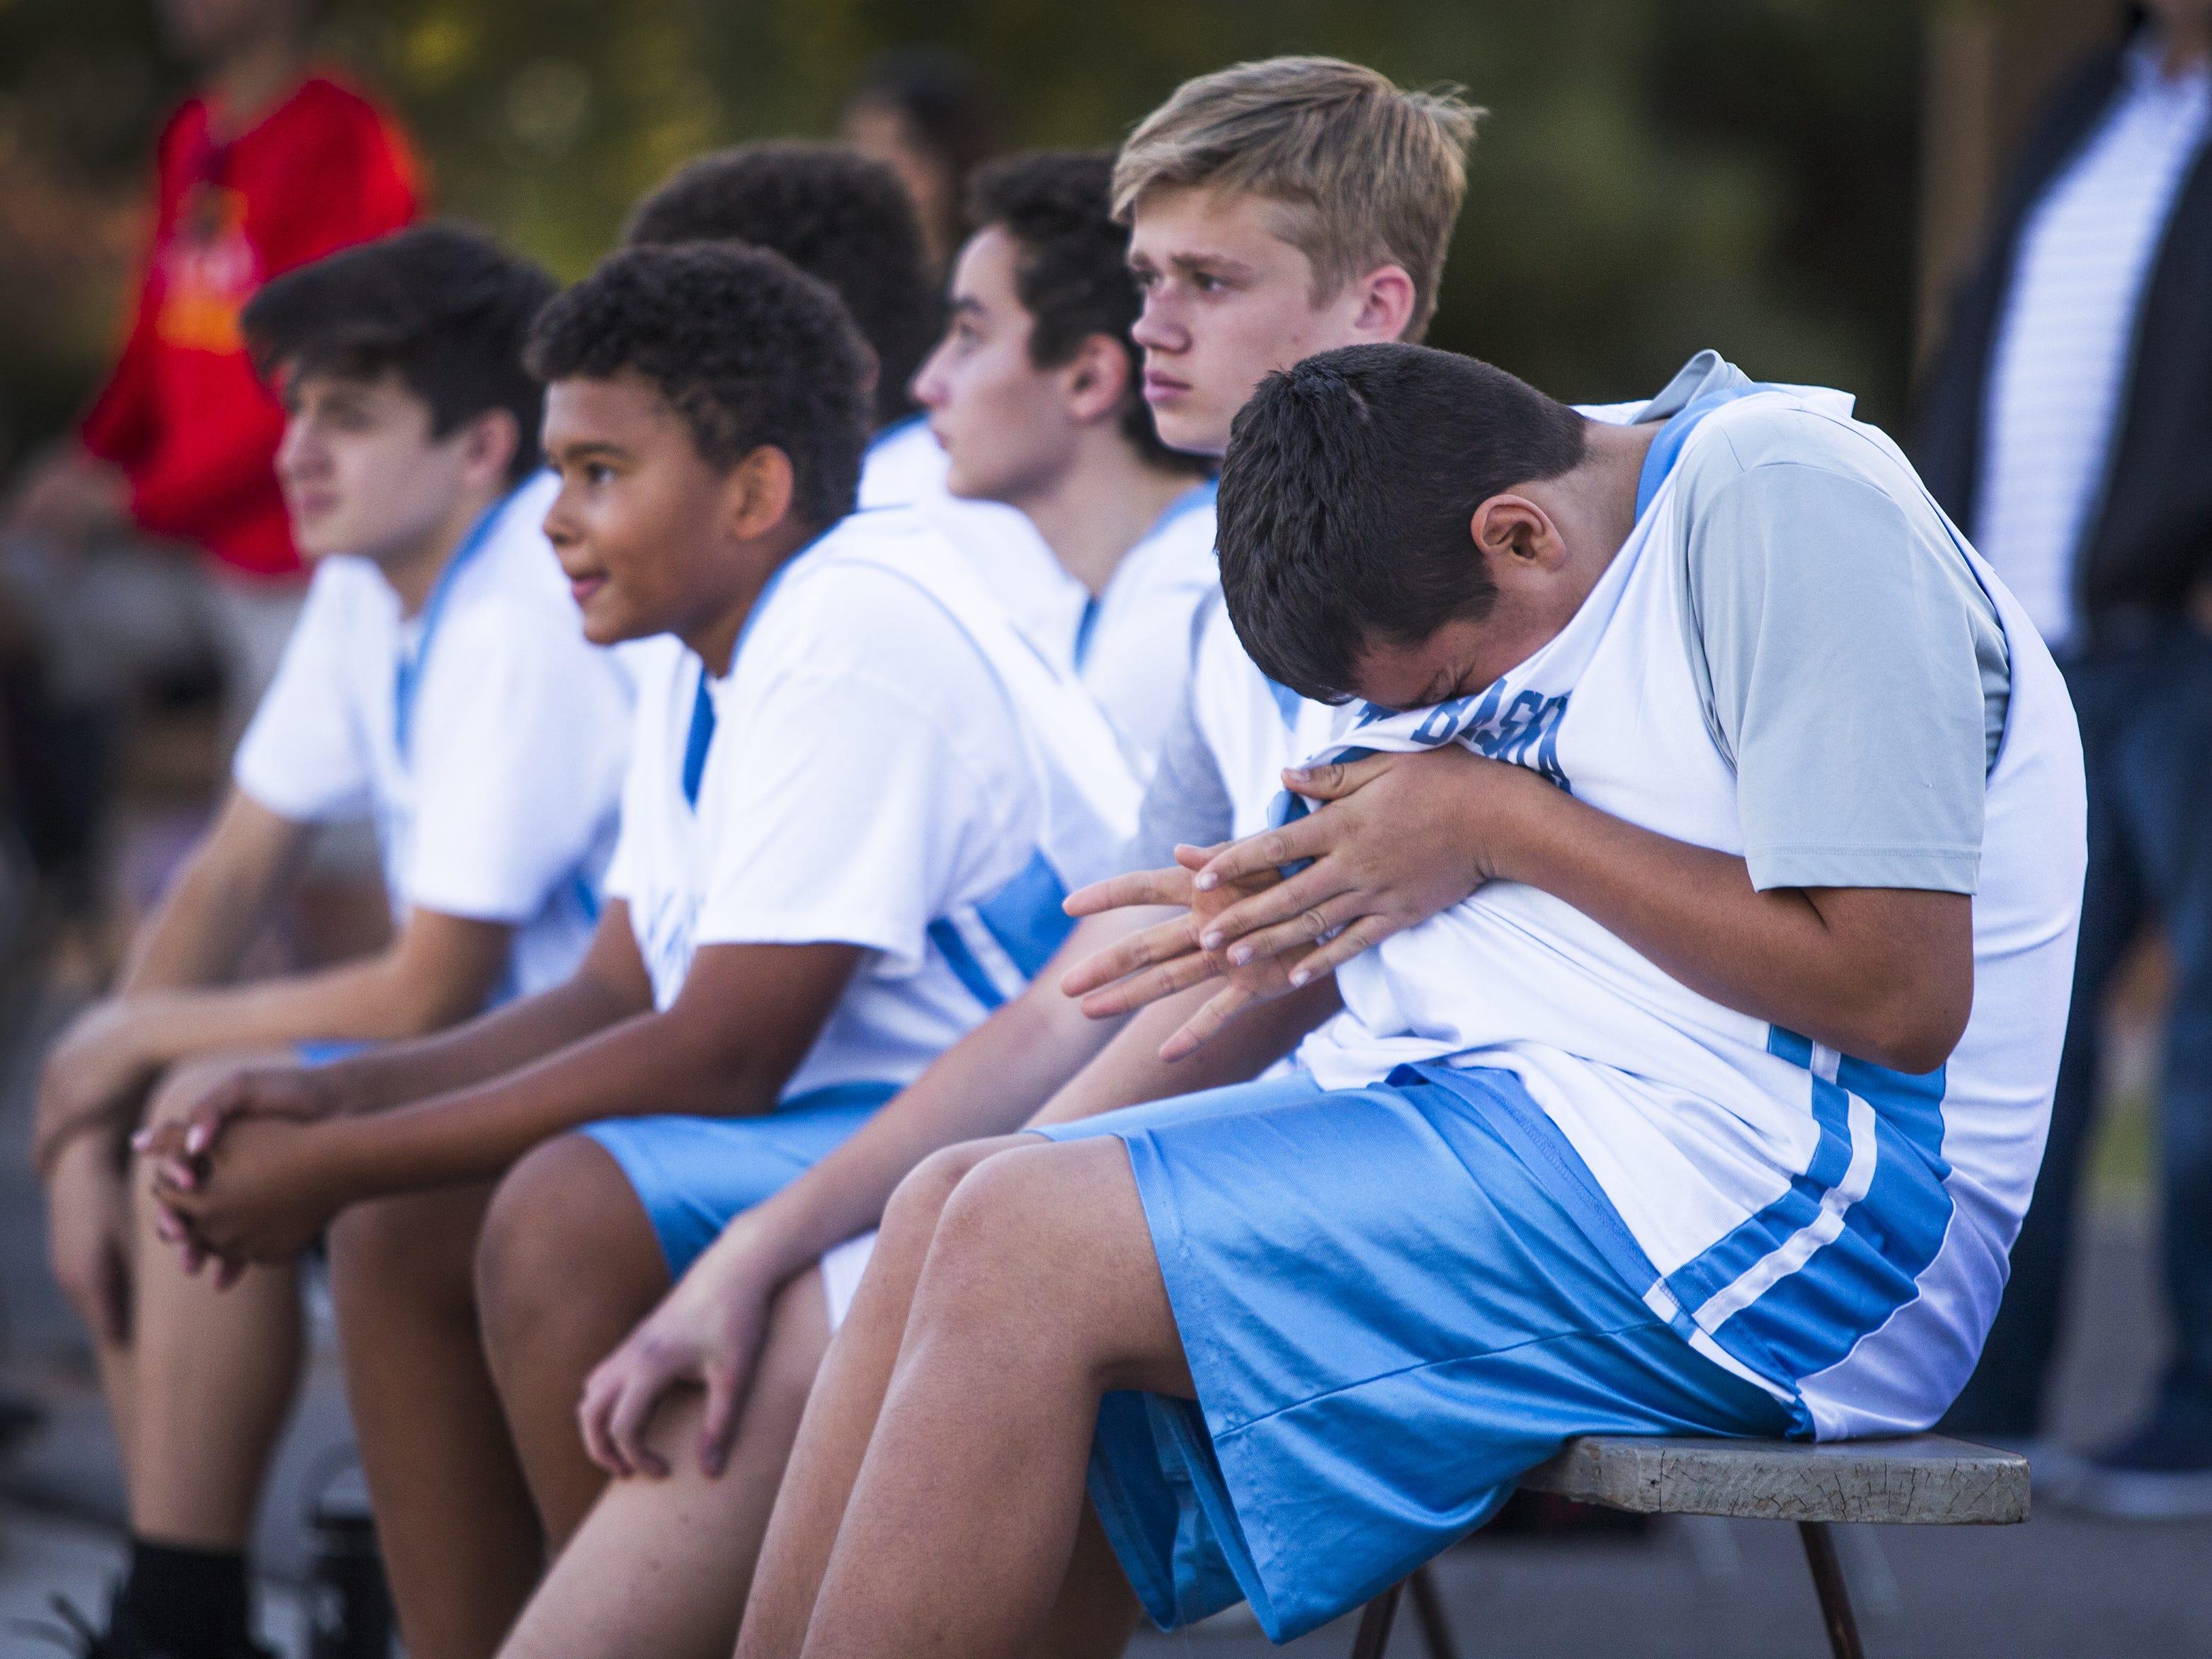 Luke Stockstad, who has autism, waits his turn to go in for his team, St. Mary-Basha Catholic School, as they play St. John Bosco, Tuesday, November 27, 2018.